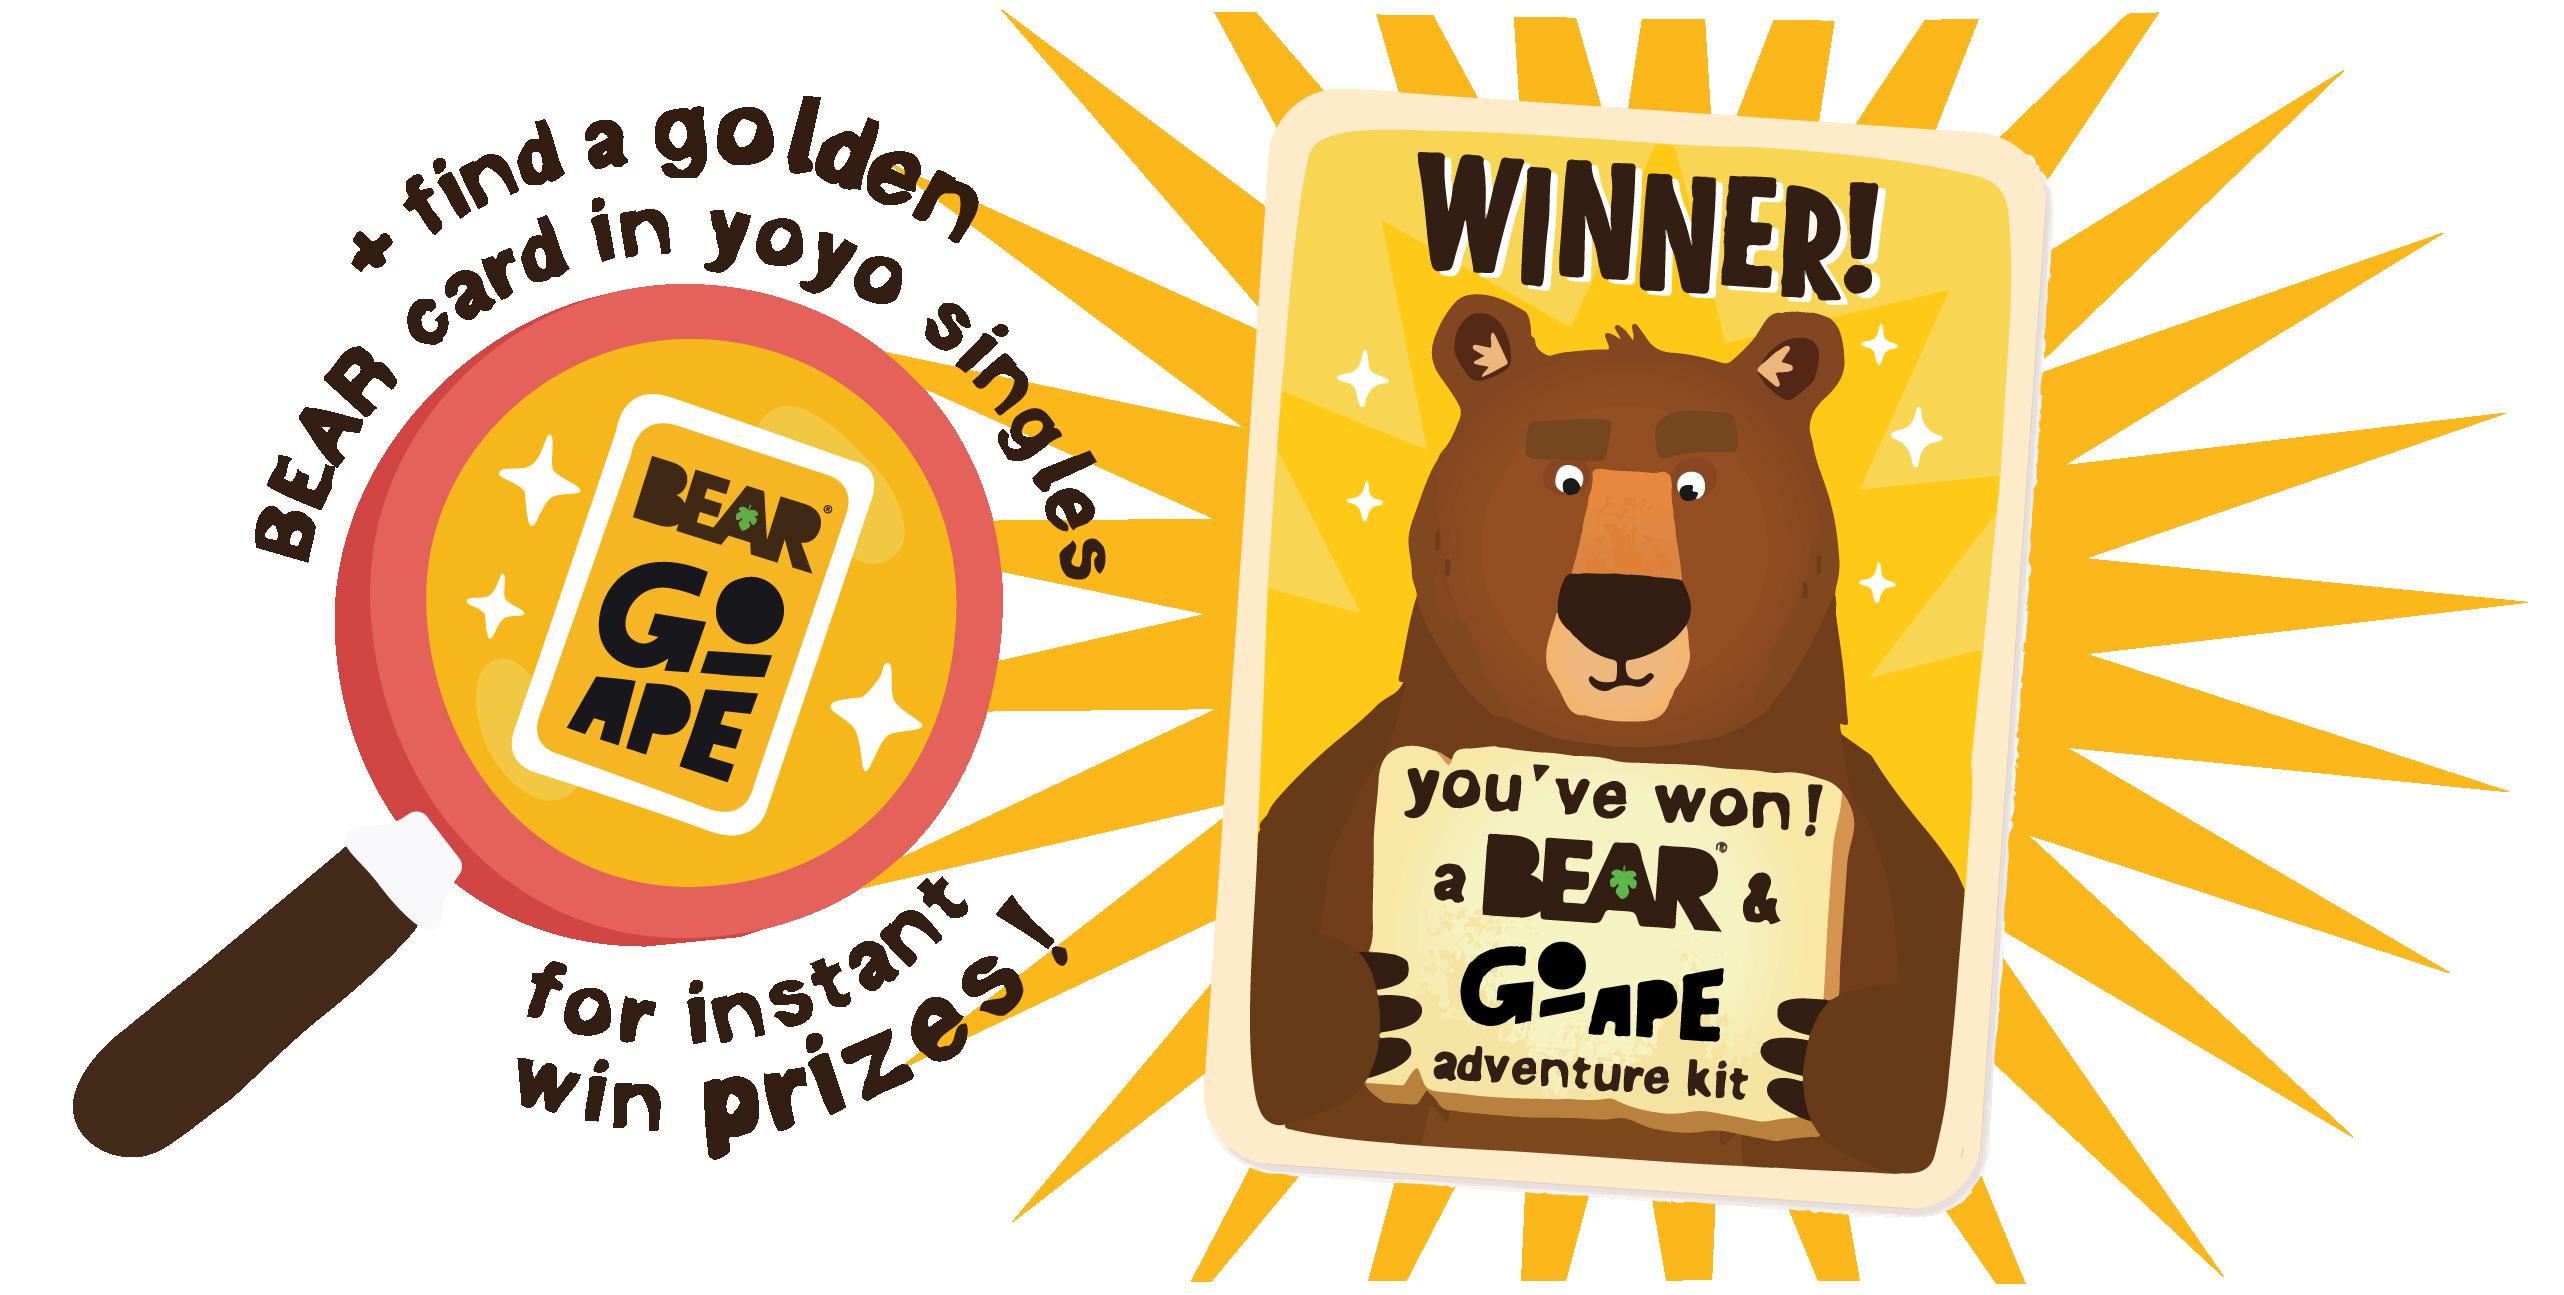 Find a golden BEAR Card tin yo yo singles for instant win prizes